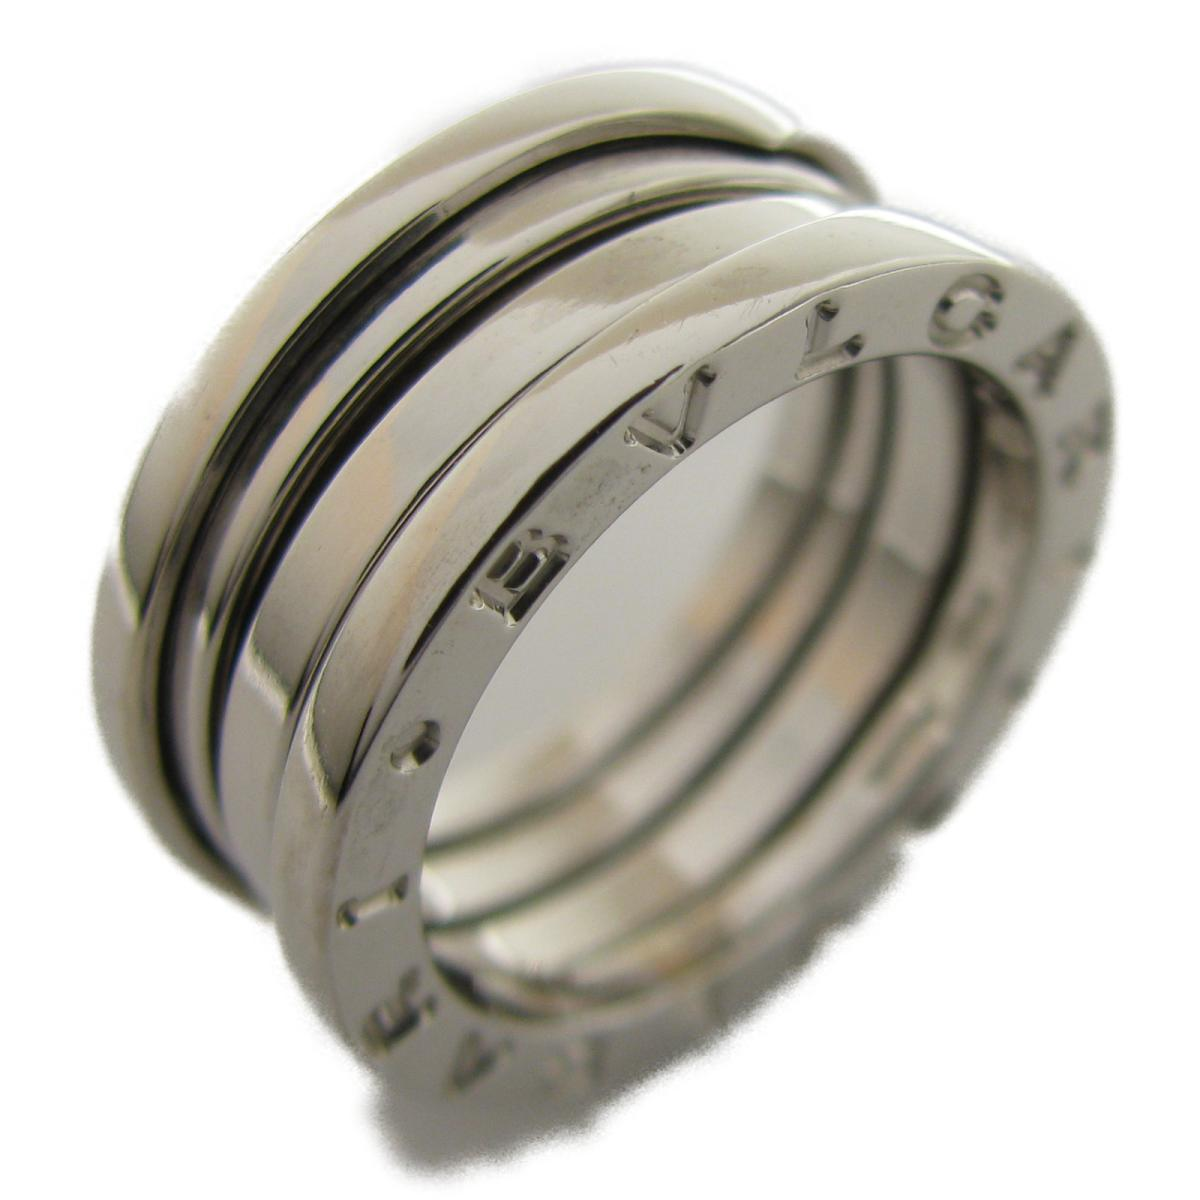 8b117ae95602 中古】 ブルガリ B-zero1 リング 指輪 Sサイズ メンズ レディース K18WG ...